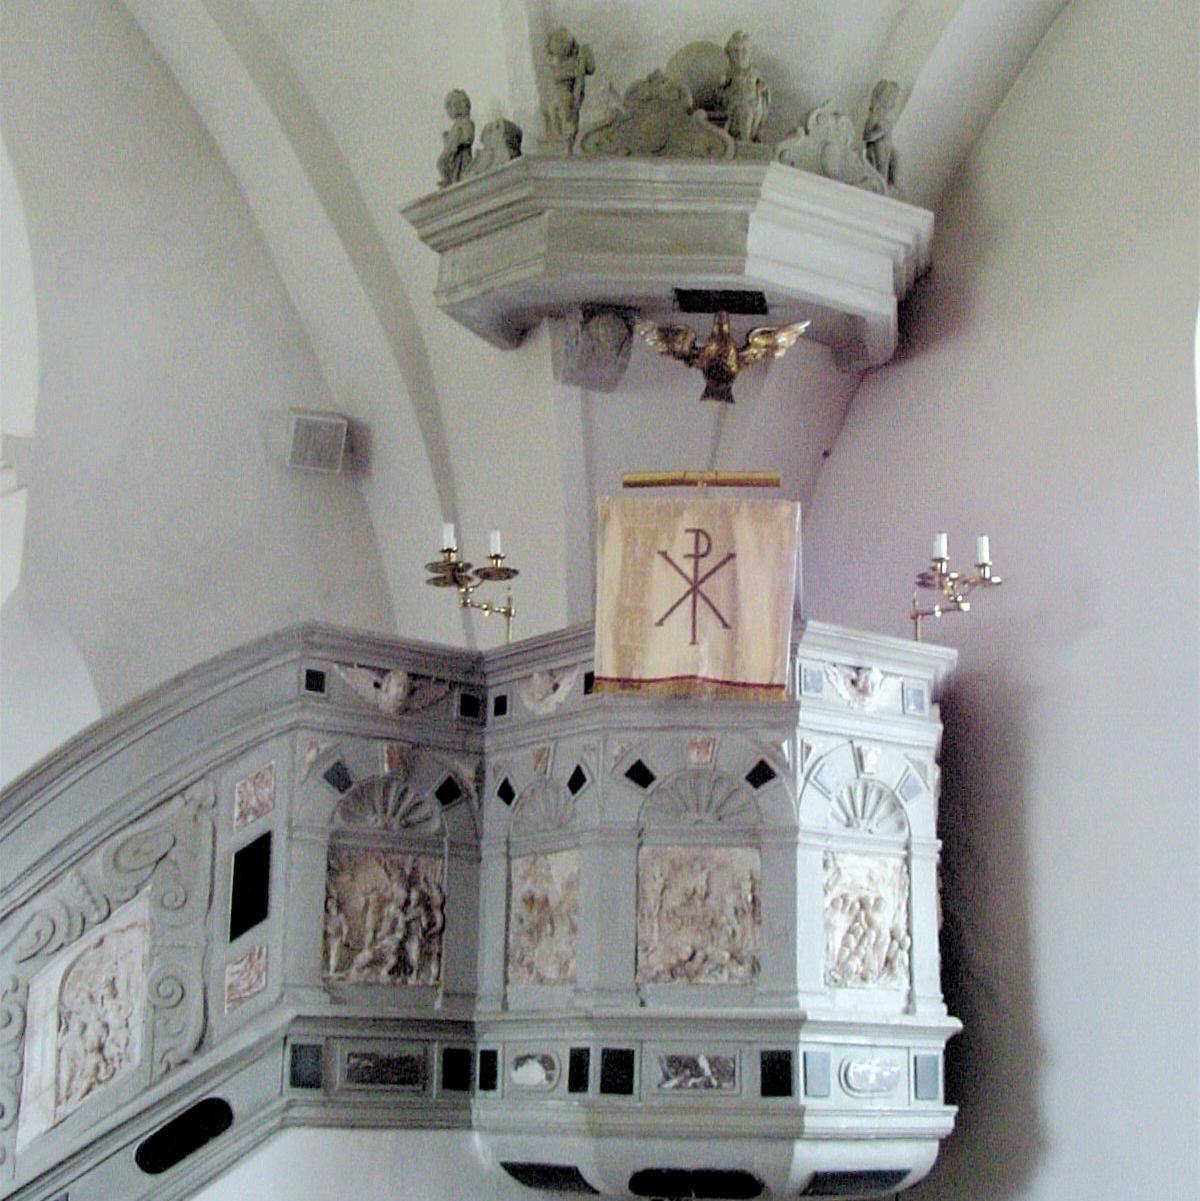 © Kävlinge kommun, Löddeköpinge church